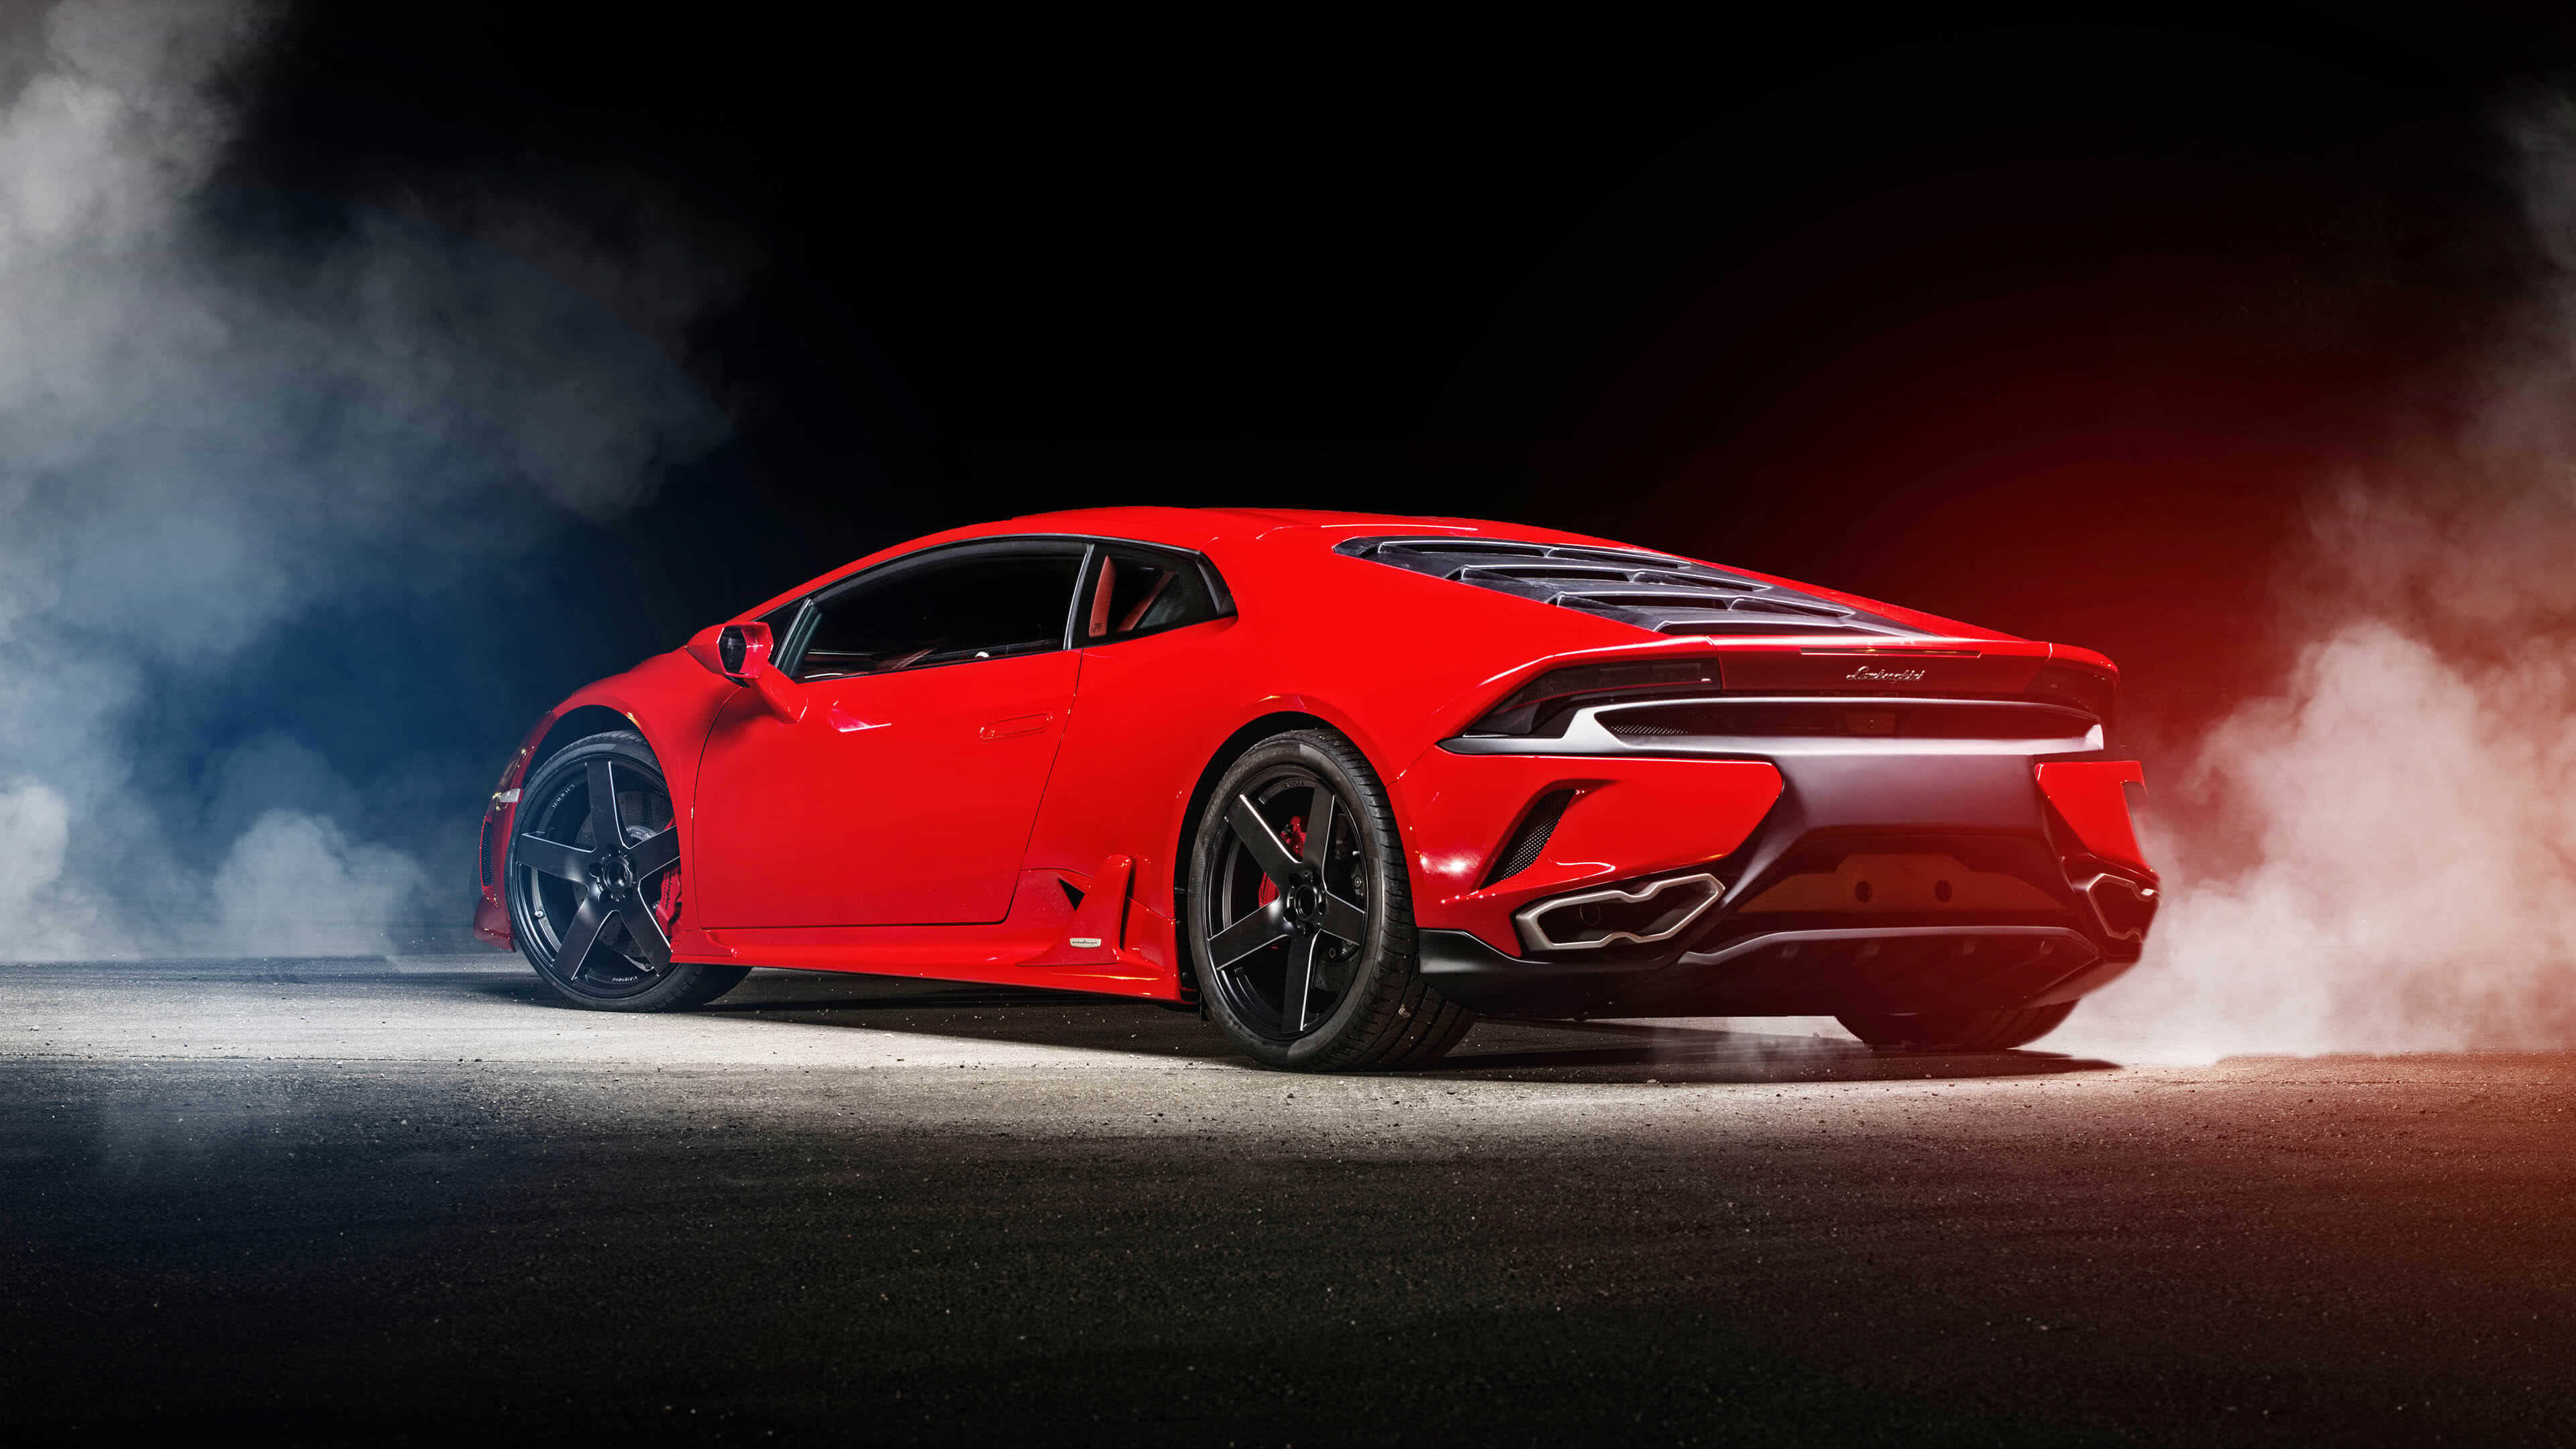 Red Lamborghini Huracan UHD 4K Wallpaper Pixelz 3840x2160